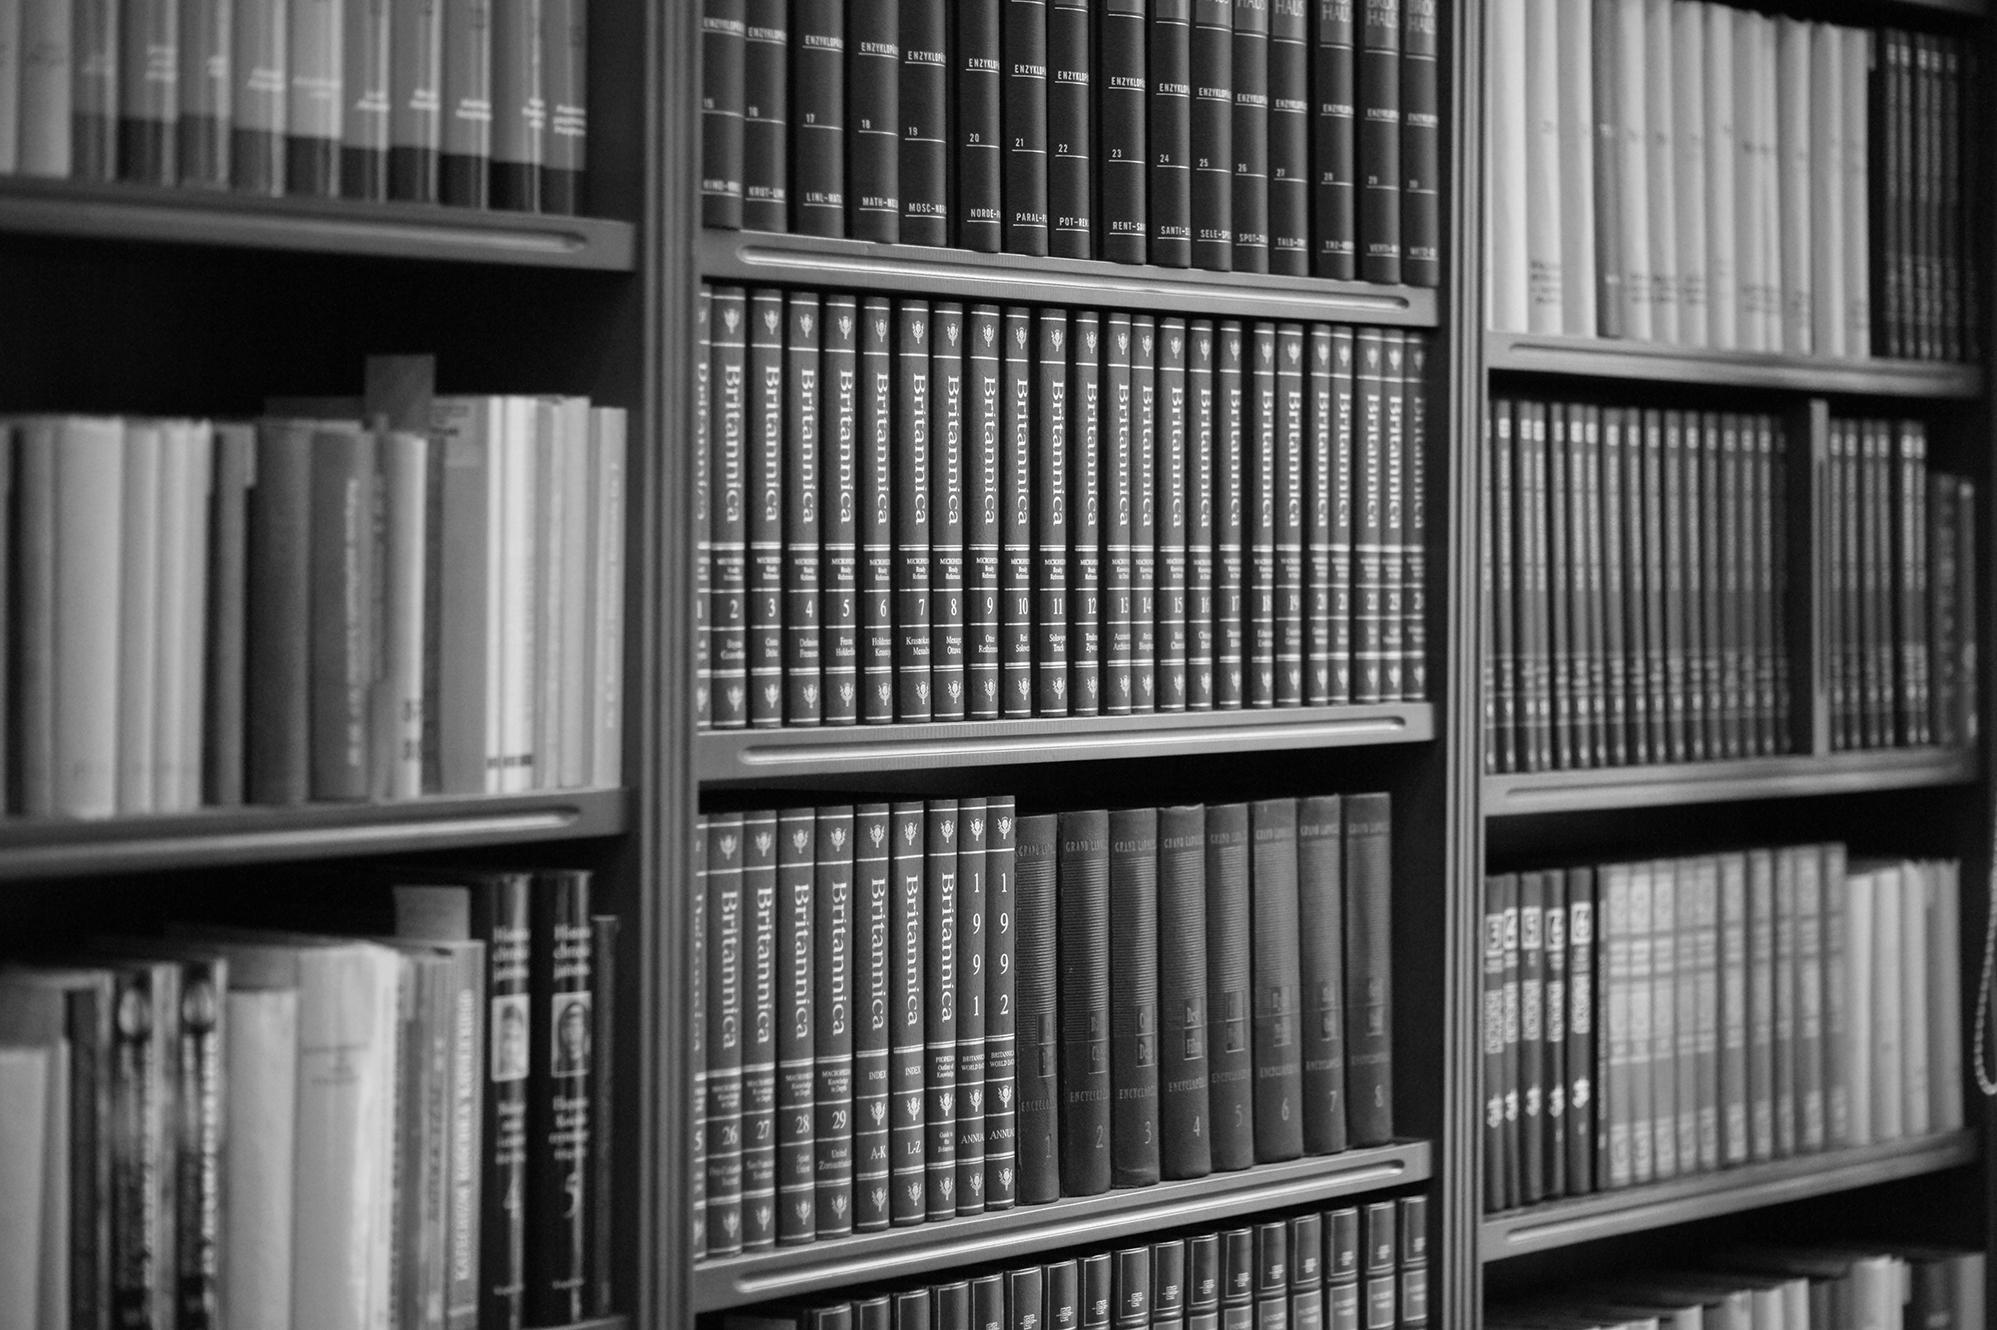 Kategoria: Książki